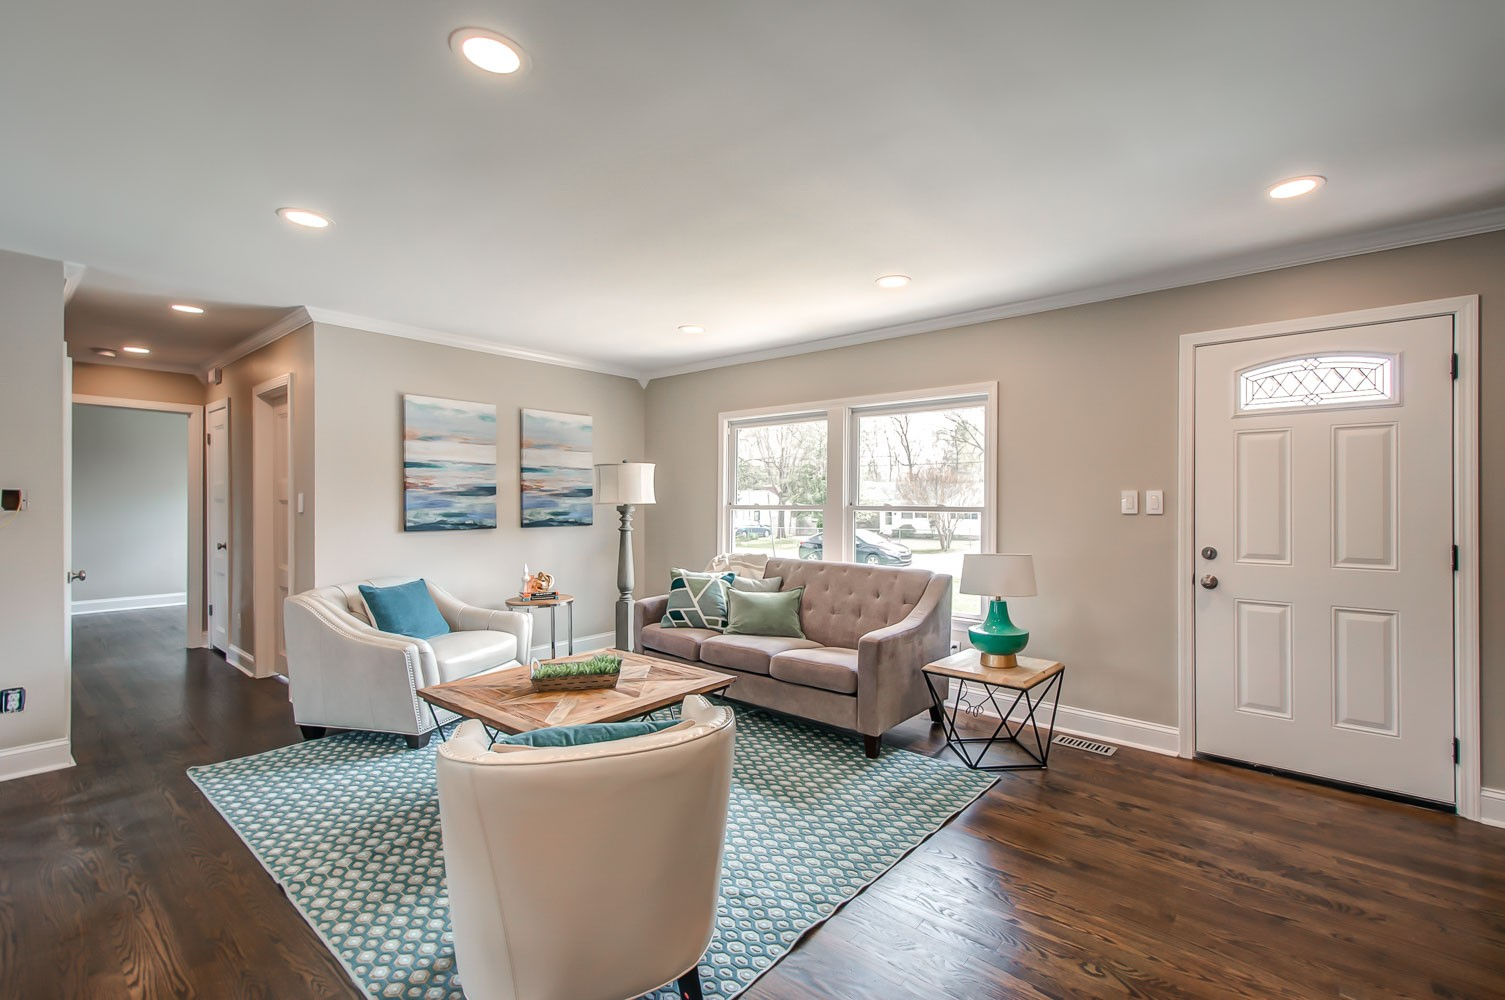 905 McMahan Ave, Nashville, TN 37216 - Nashville, TN real estate listing